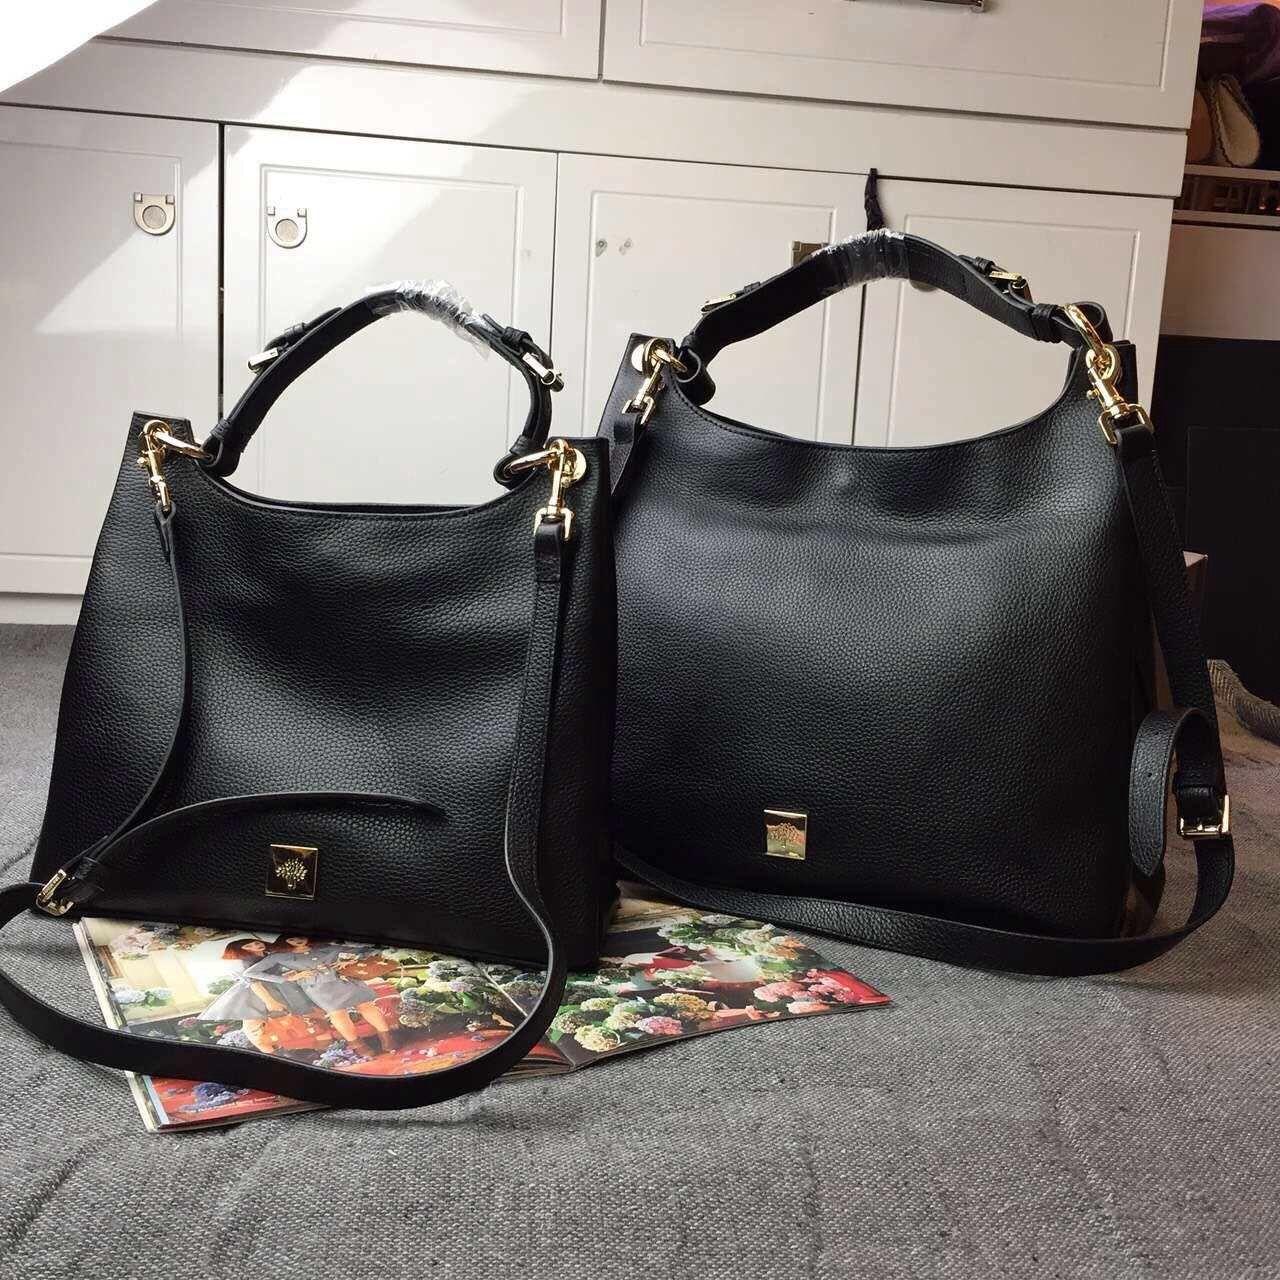 Mulberry Freya Bag   Mulberry   Pinterest   Bags, Replica handbags ... 820b2f76c5